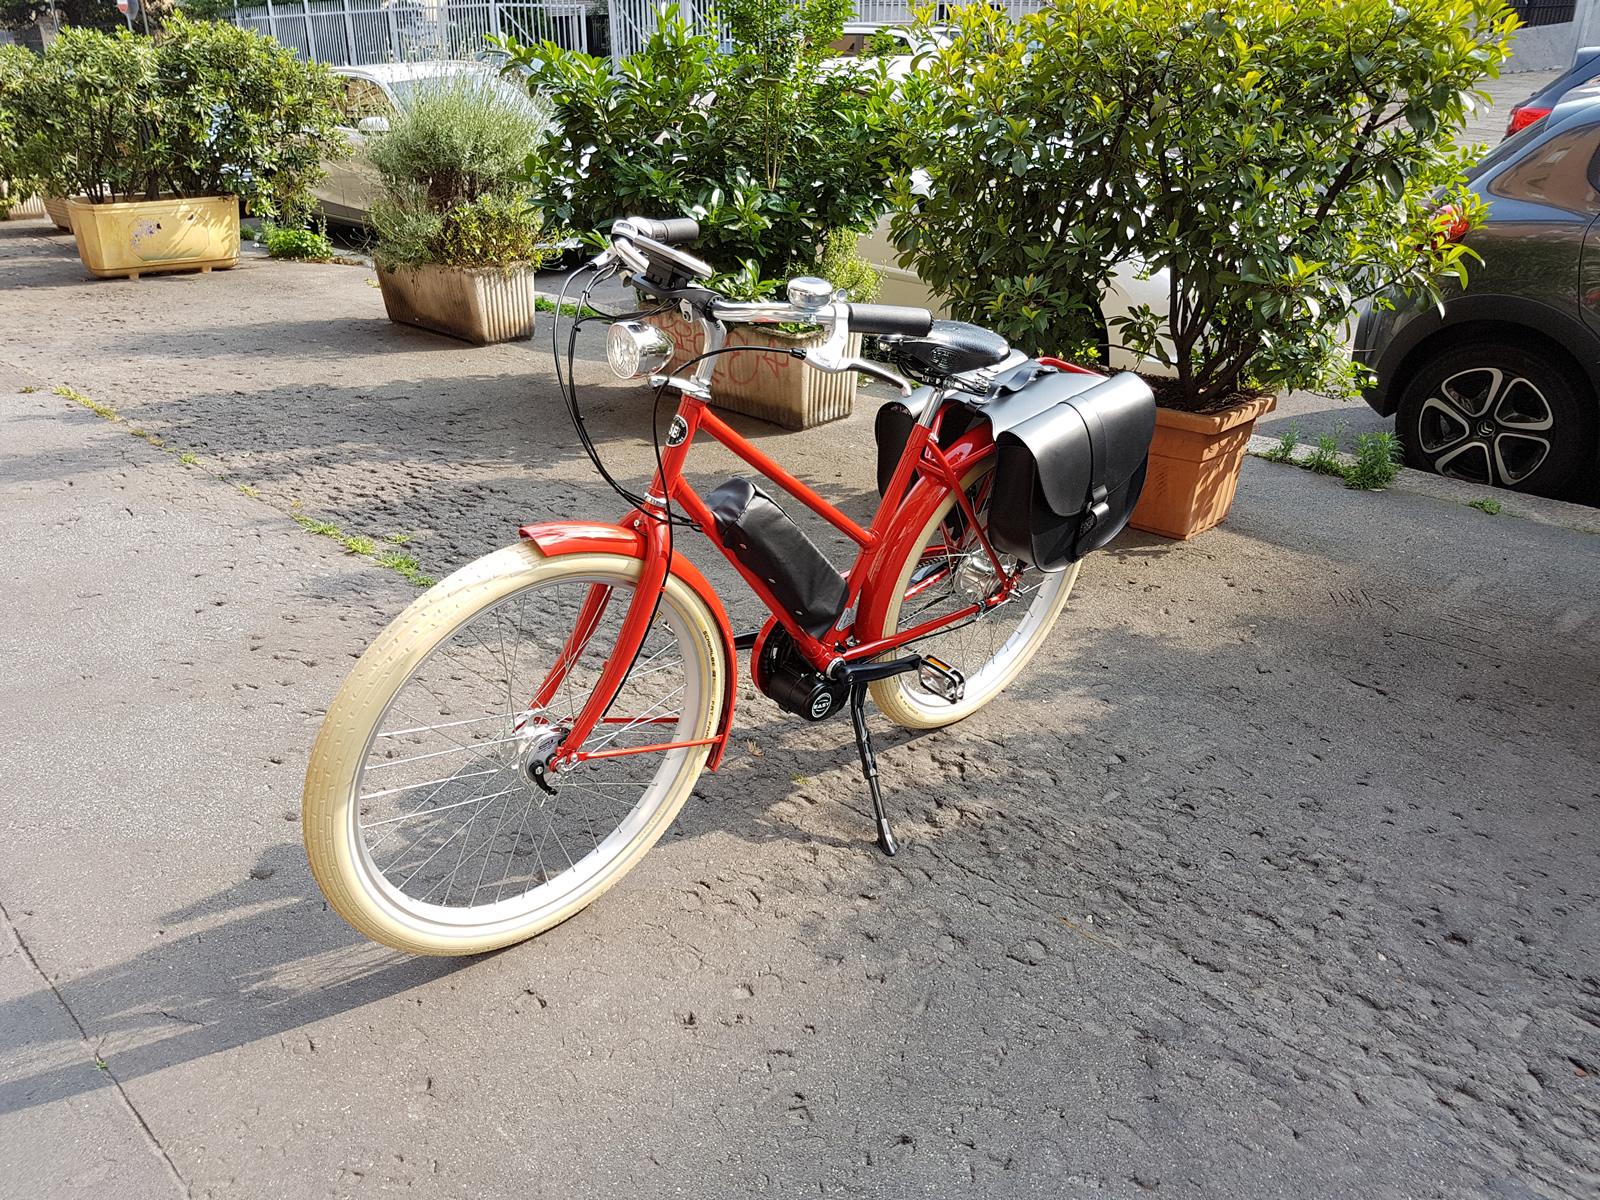 sartoribikes-bicicletta-elettrica-artigianale-vintage ...